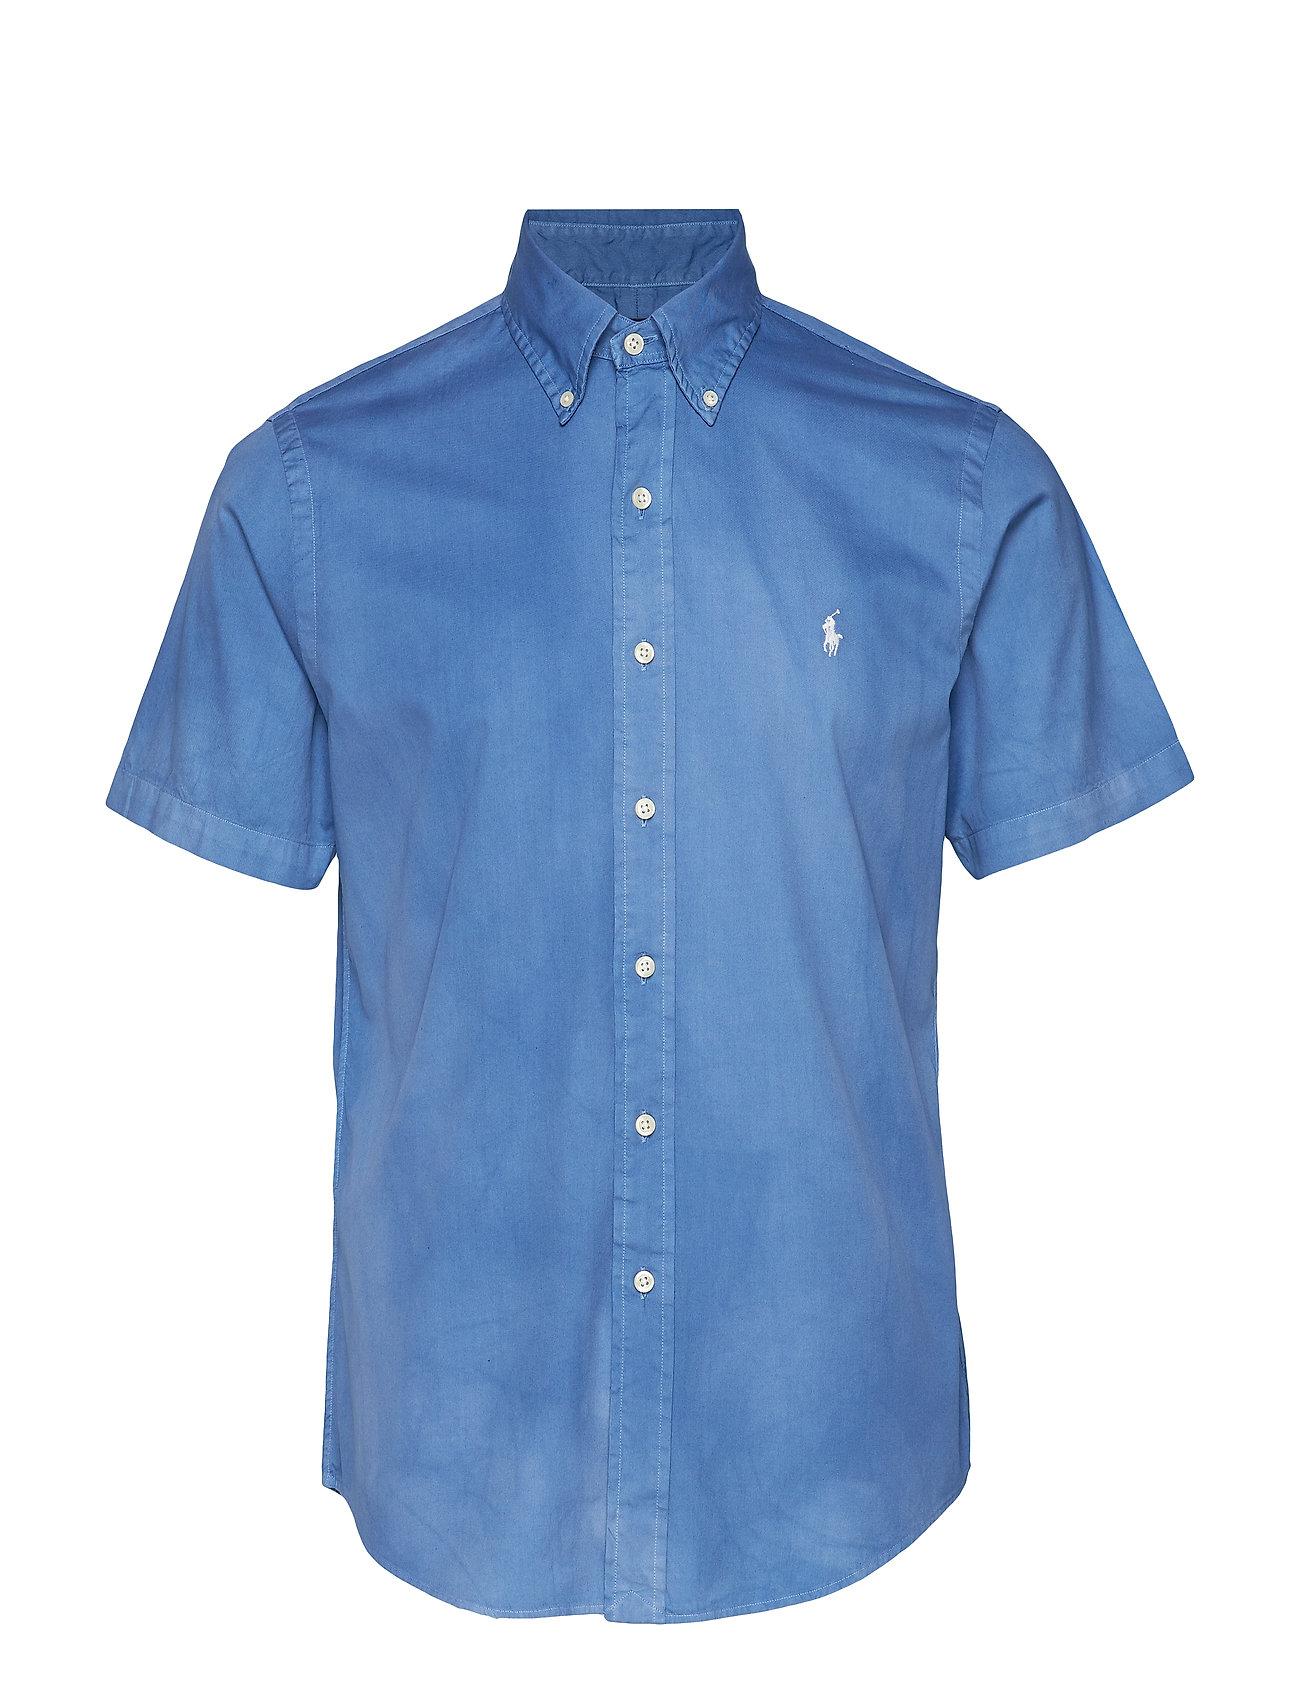 Polo Ralph Lauren Custom Fit Twill Shirt - EARTH BLUE